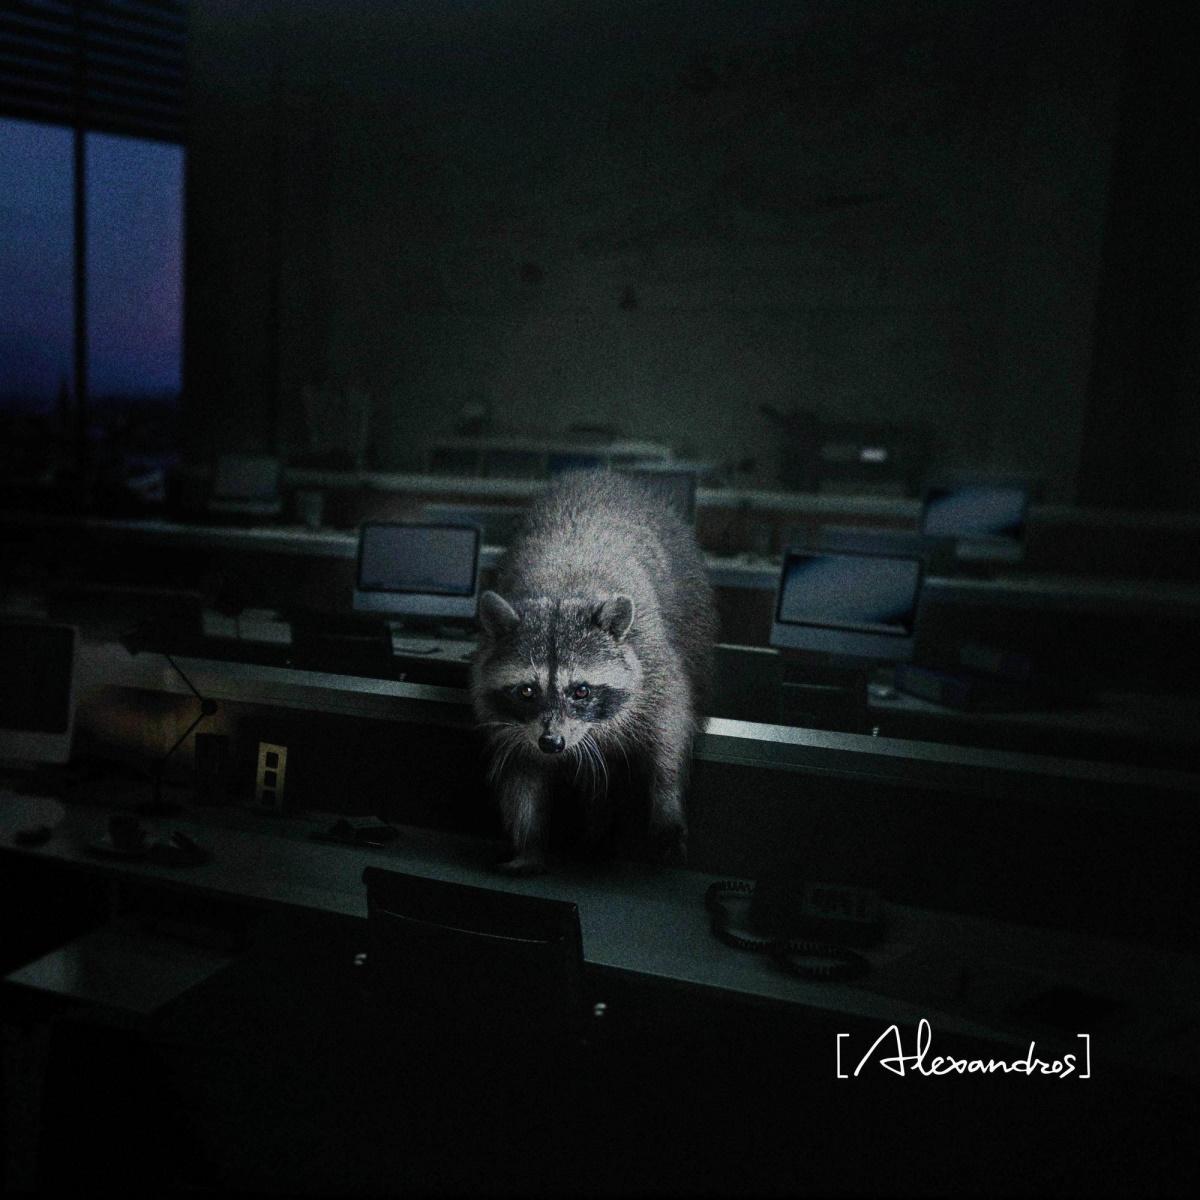 『[Alexandros] - Vague 歌詞』収録の『Beast』ジャケット